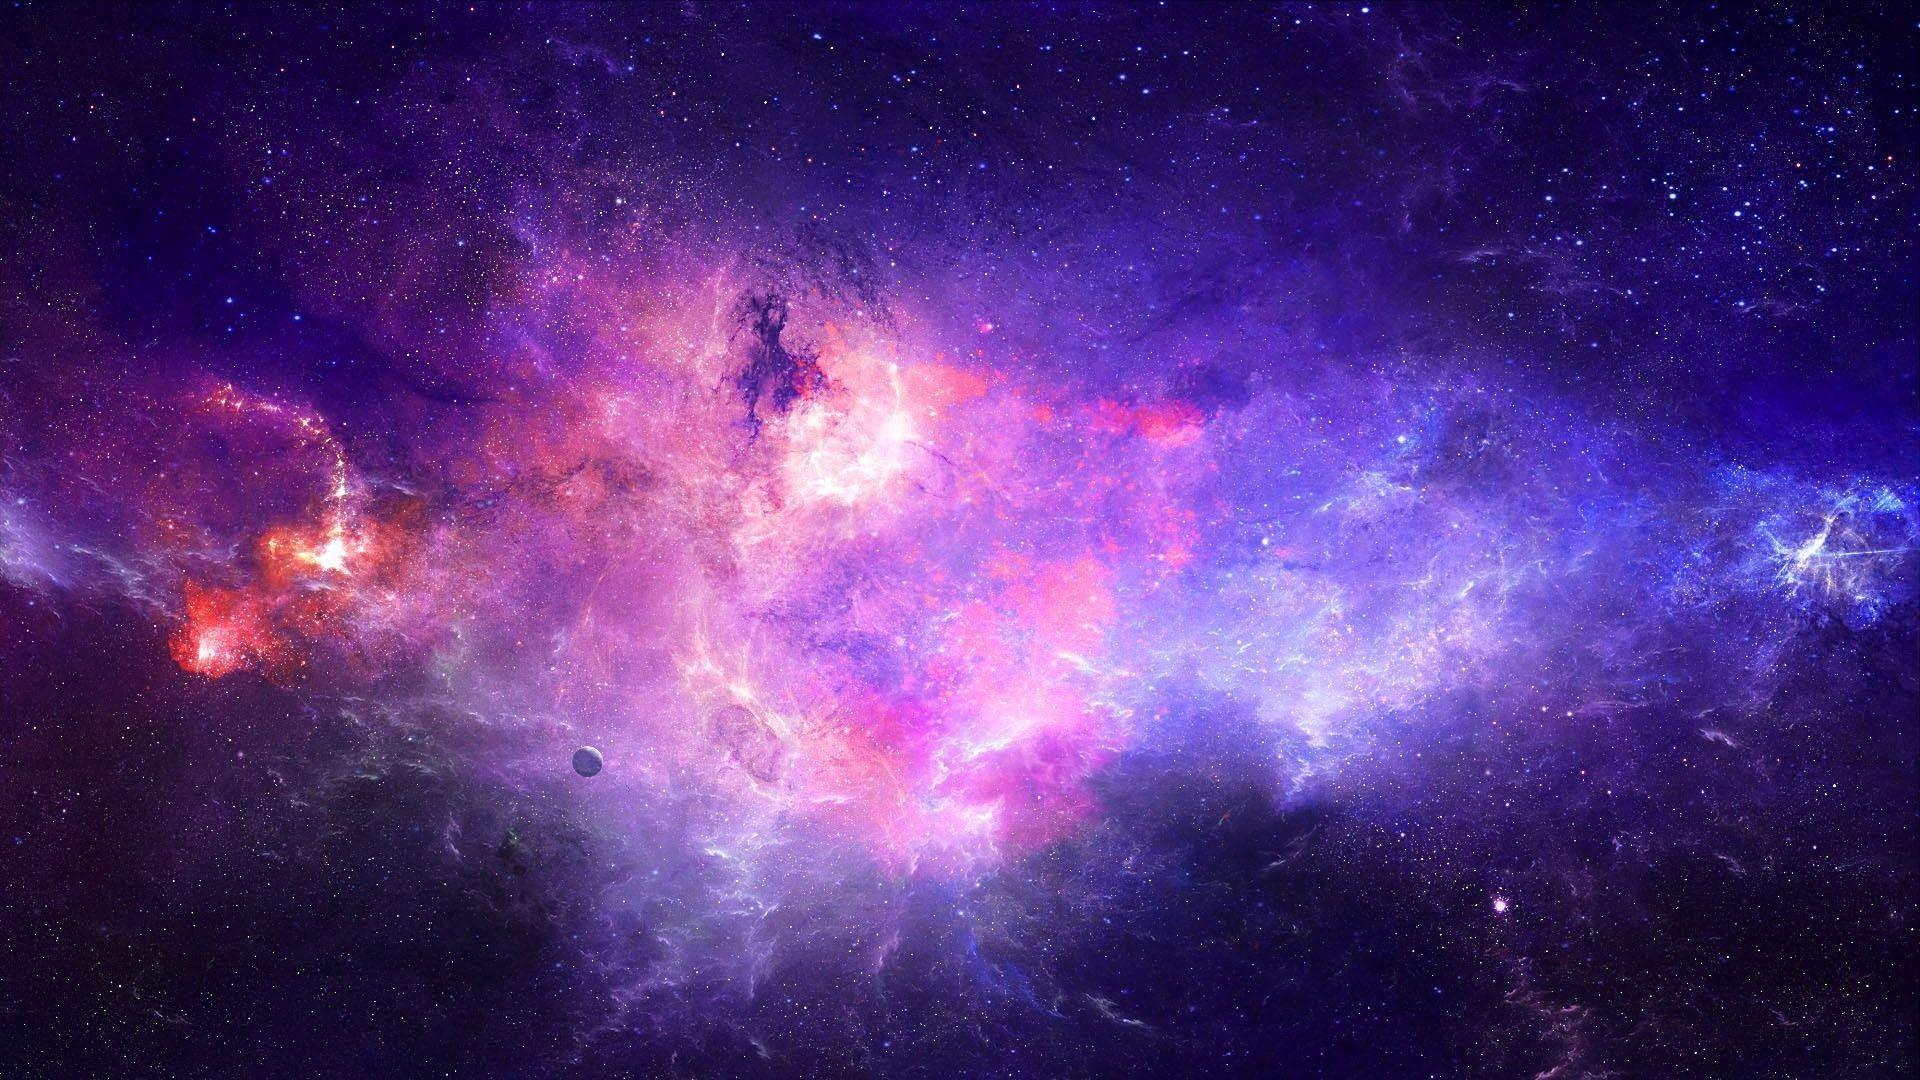 Galaxy Wallpaper Tumblr For Desktop.